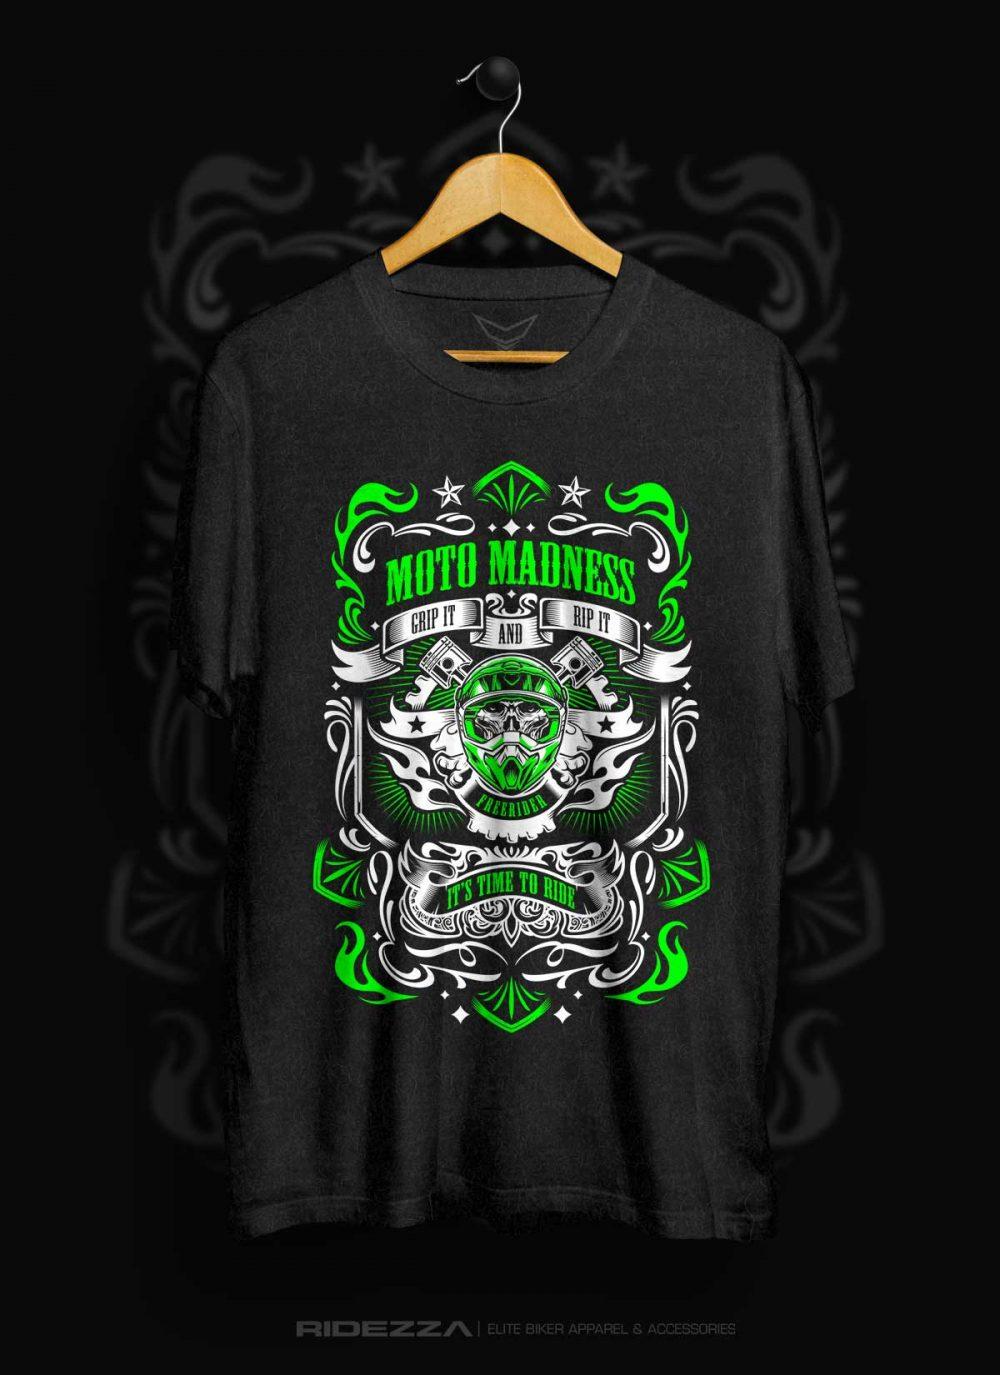 MDness_green